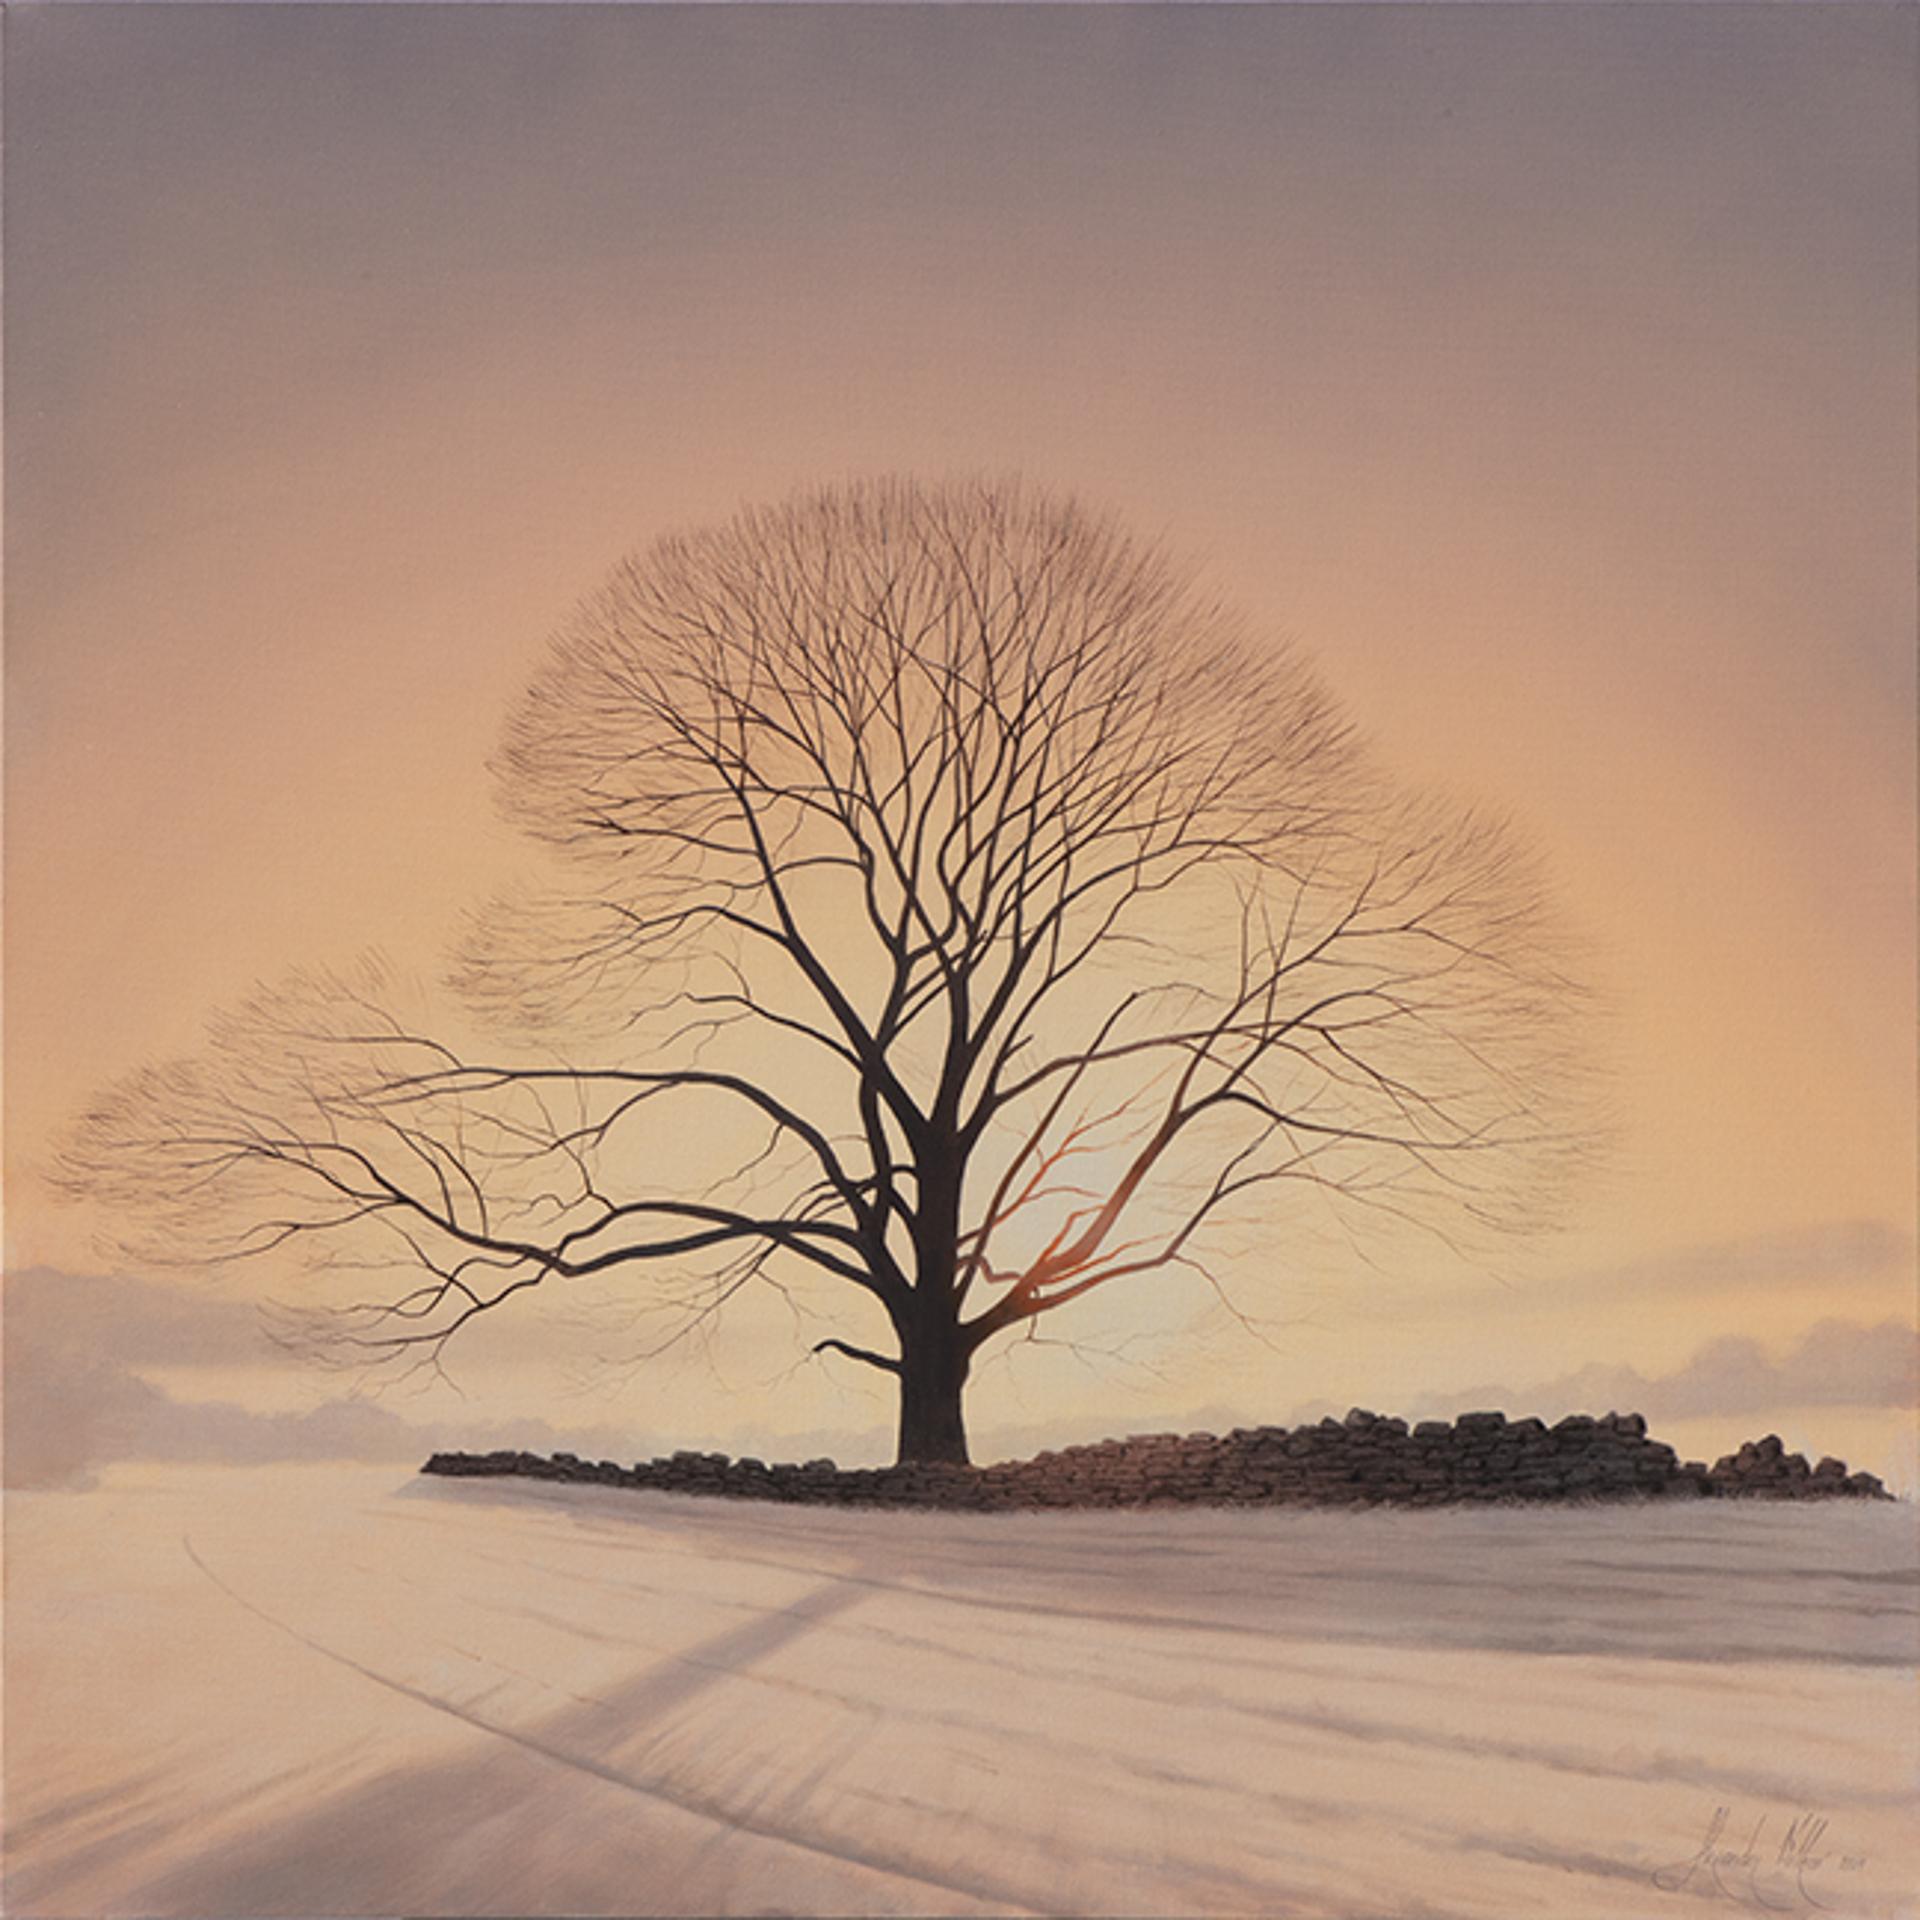 Morning Frost by Alexander Volkov